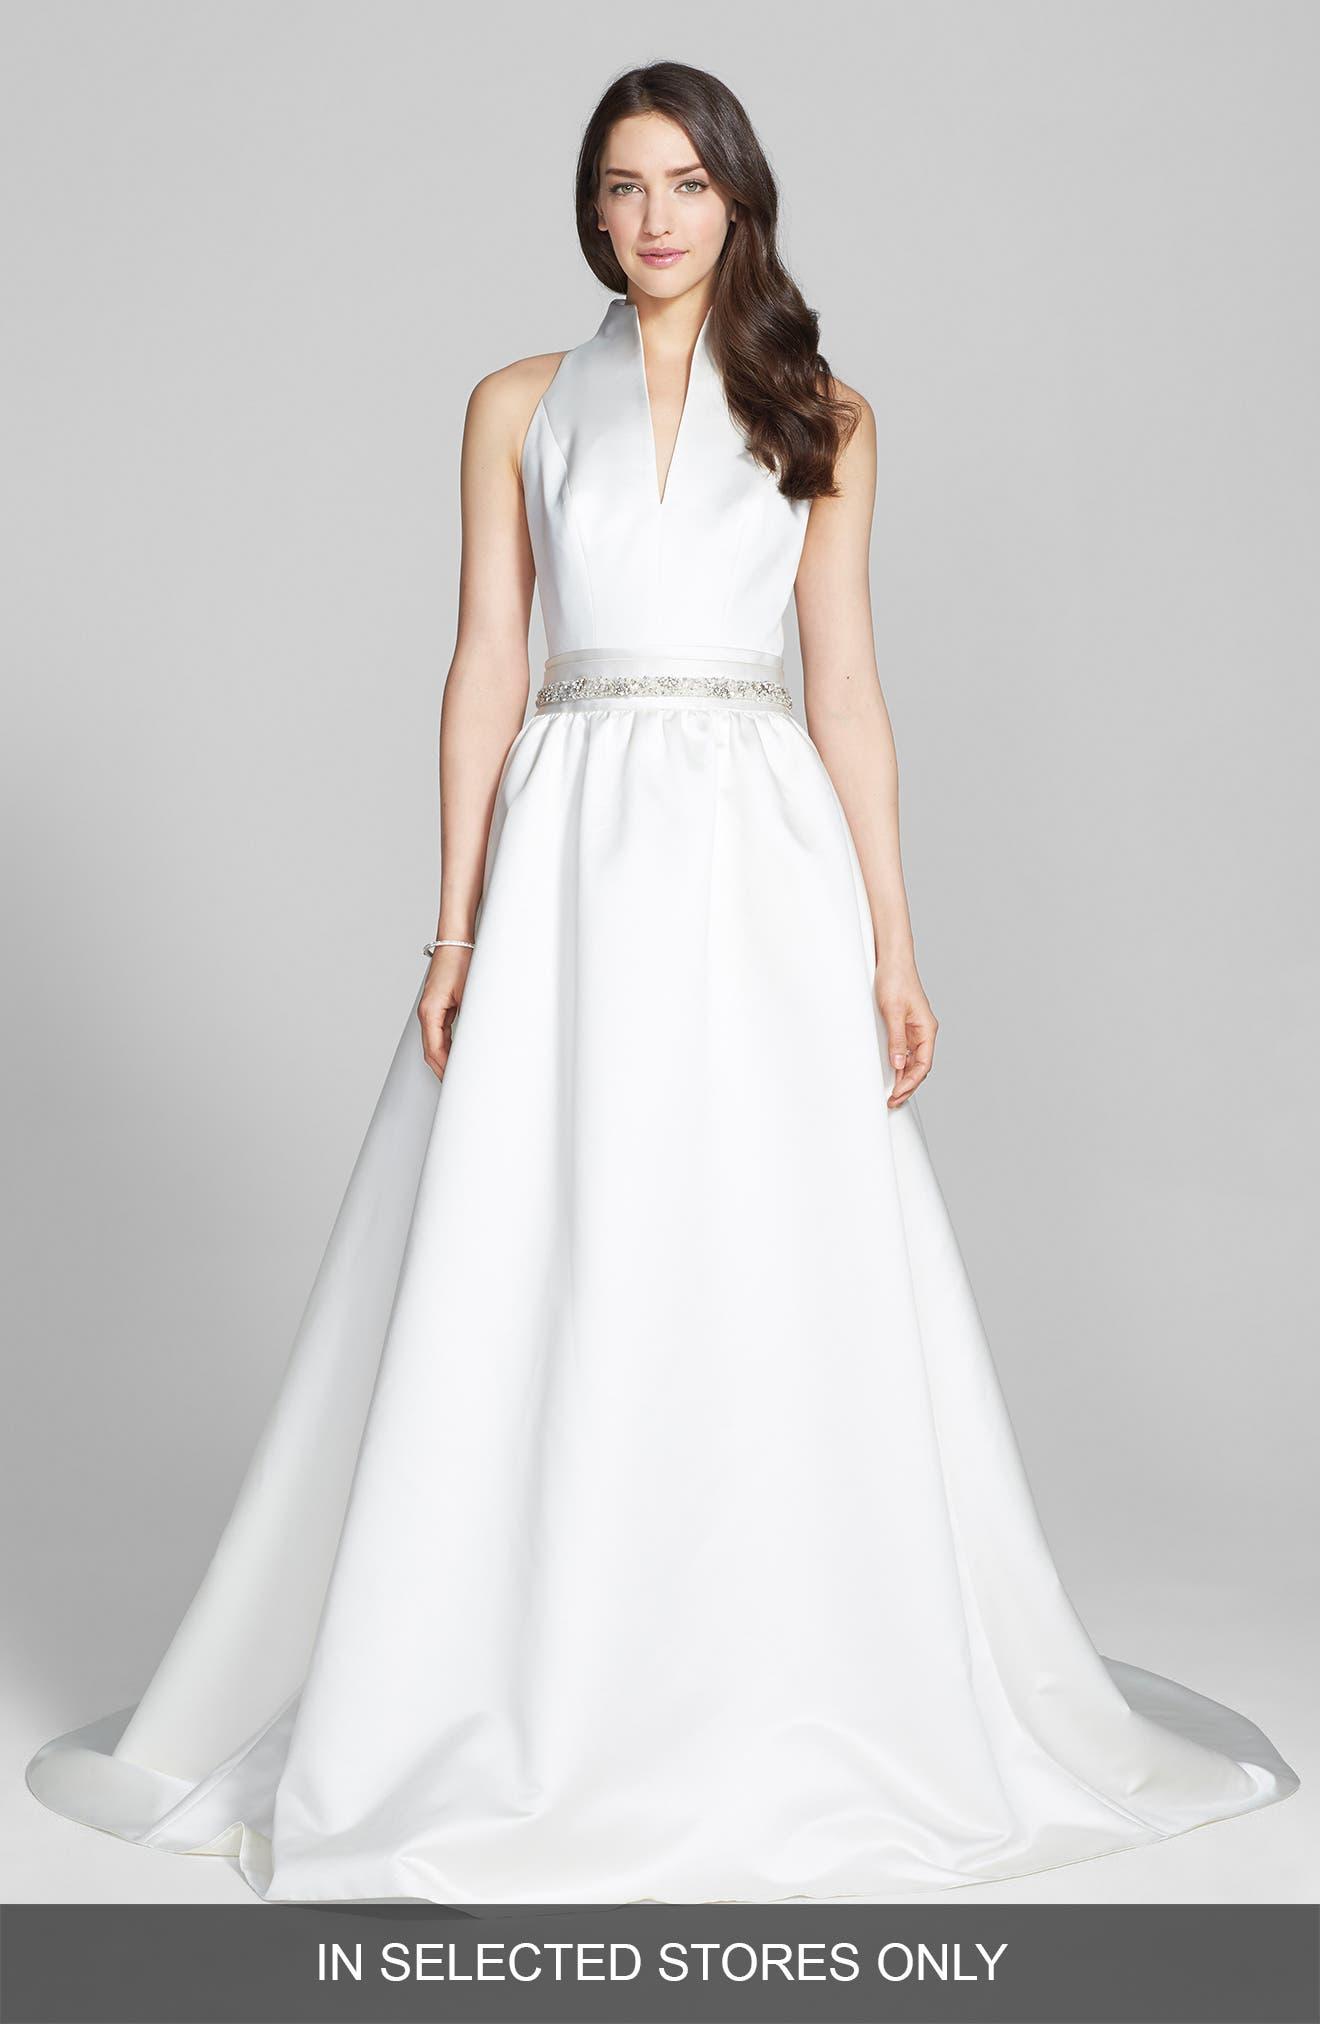 Alternate Image 1 Selected - Jesús Peiró Satin Dress with Embellished Waist Overskirt